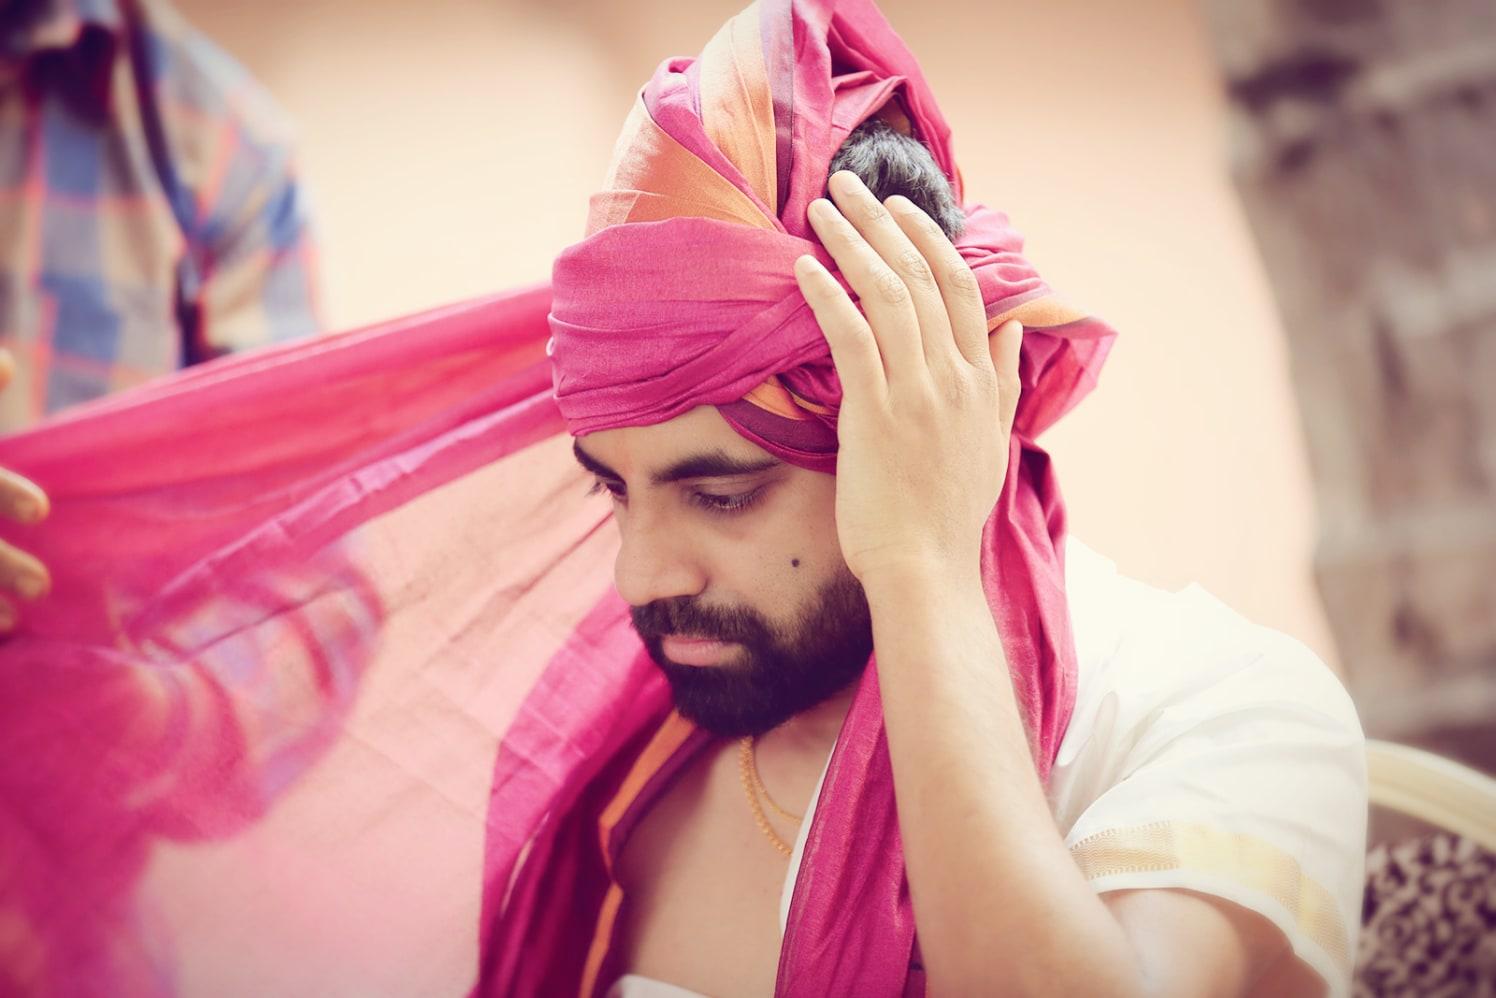 Groom Wearing a Pink Turban by Priyanka Wedding-photography | Weddings Photos & Ideas